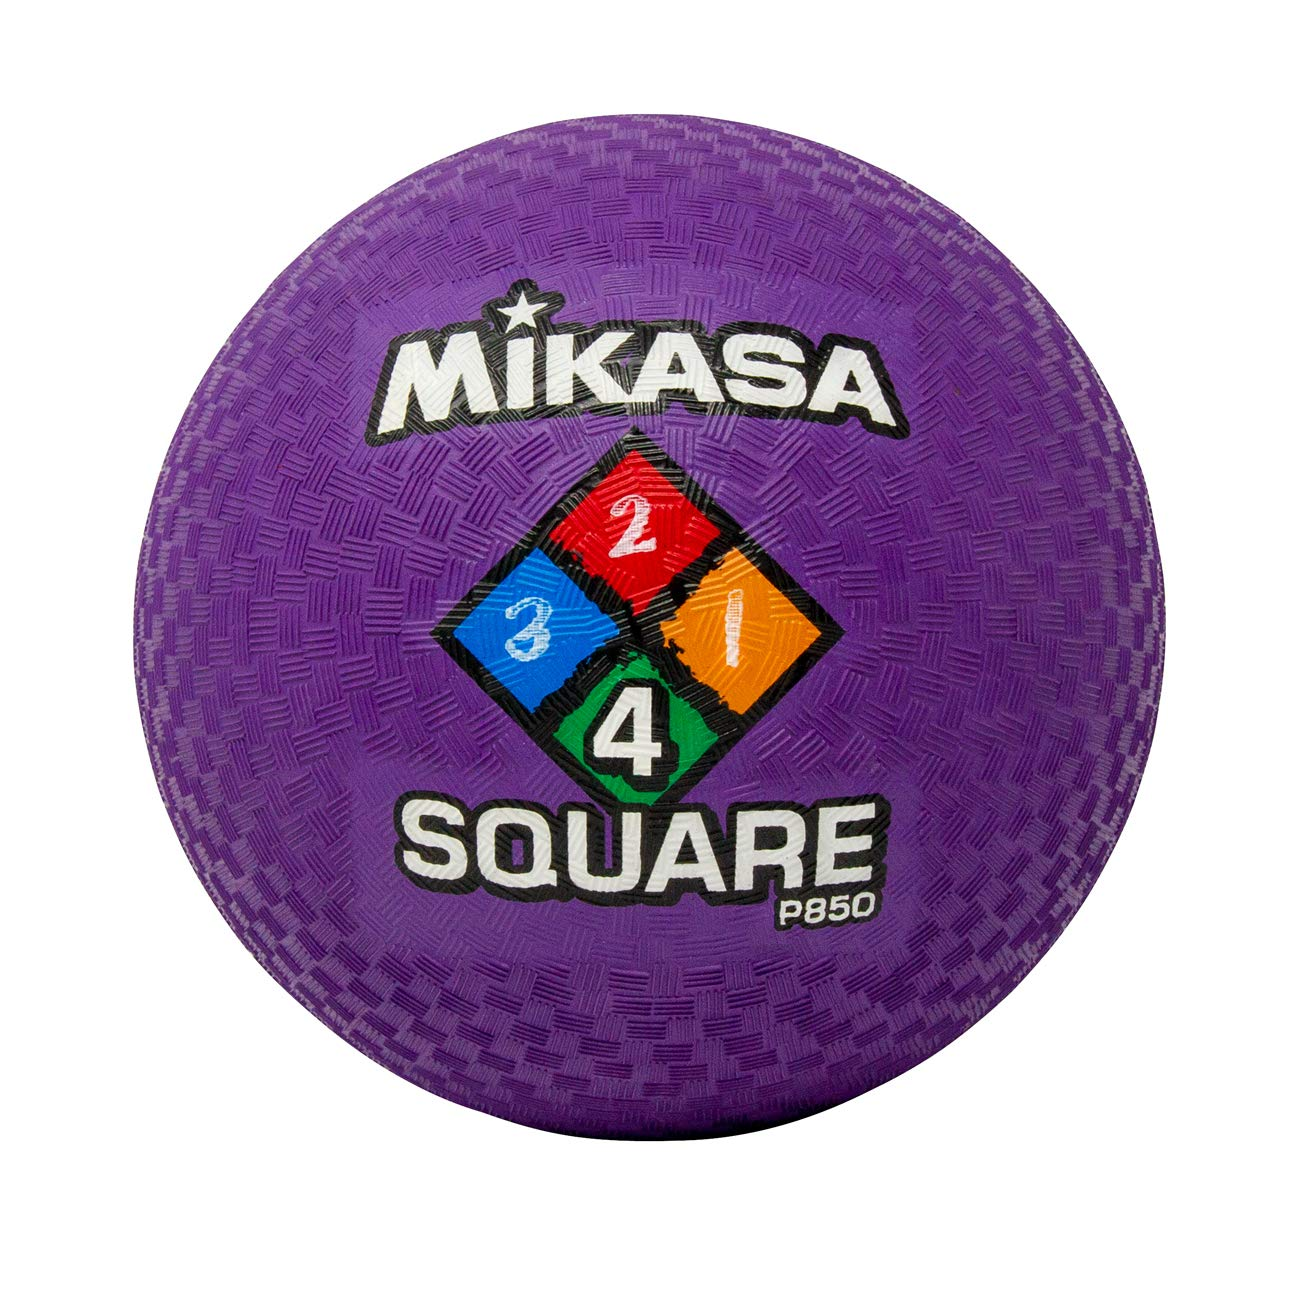 Mikasa Playground Ball (Purple, 8.5-Inch) by Mikasa Sports